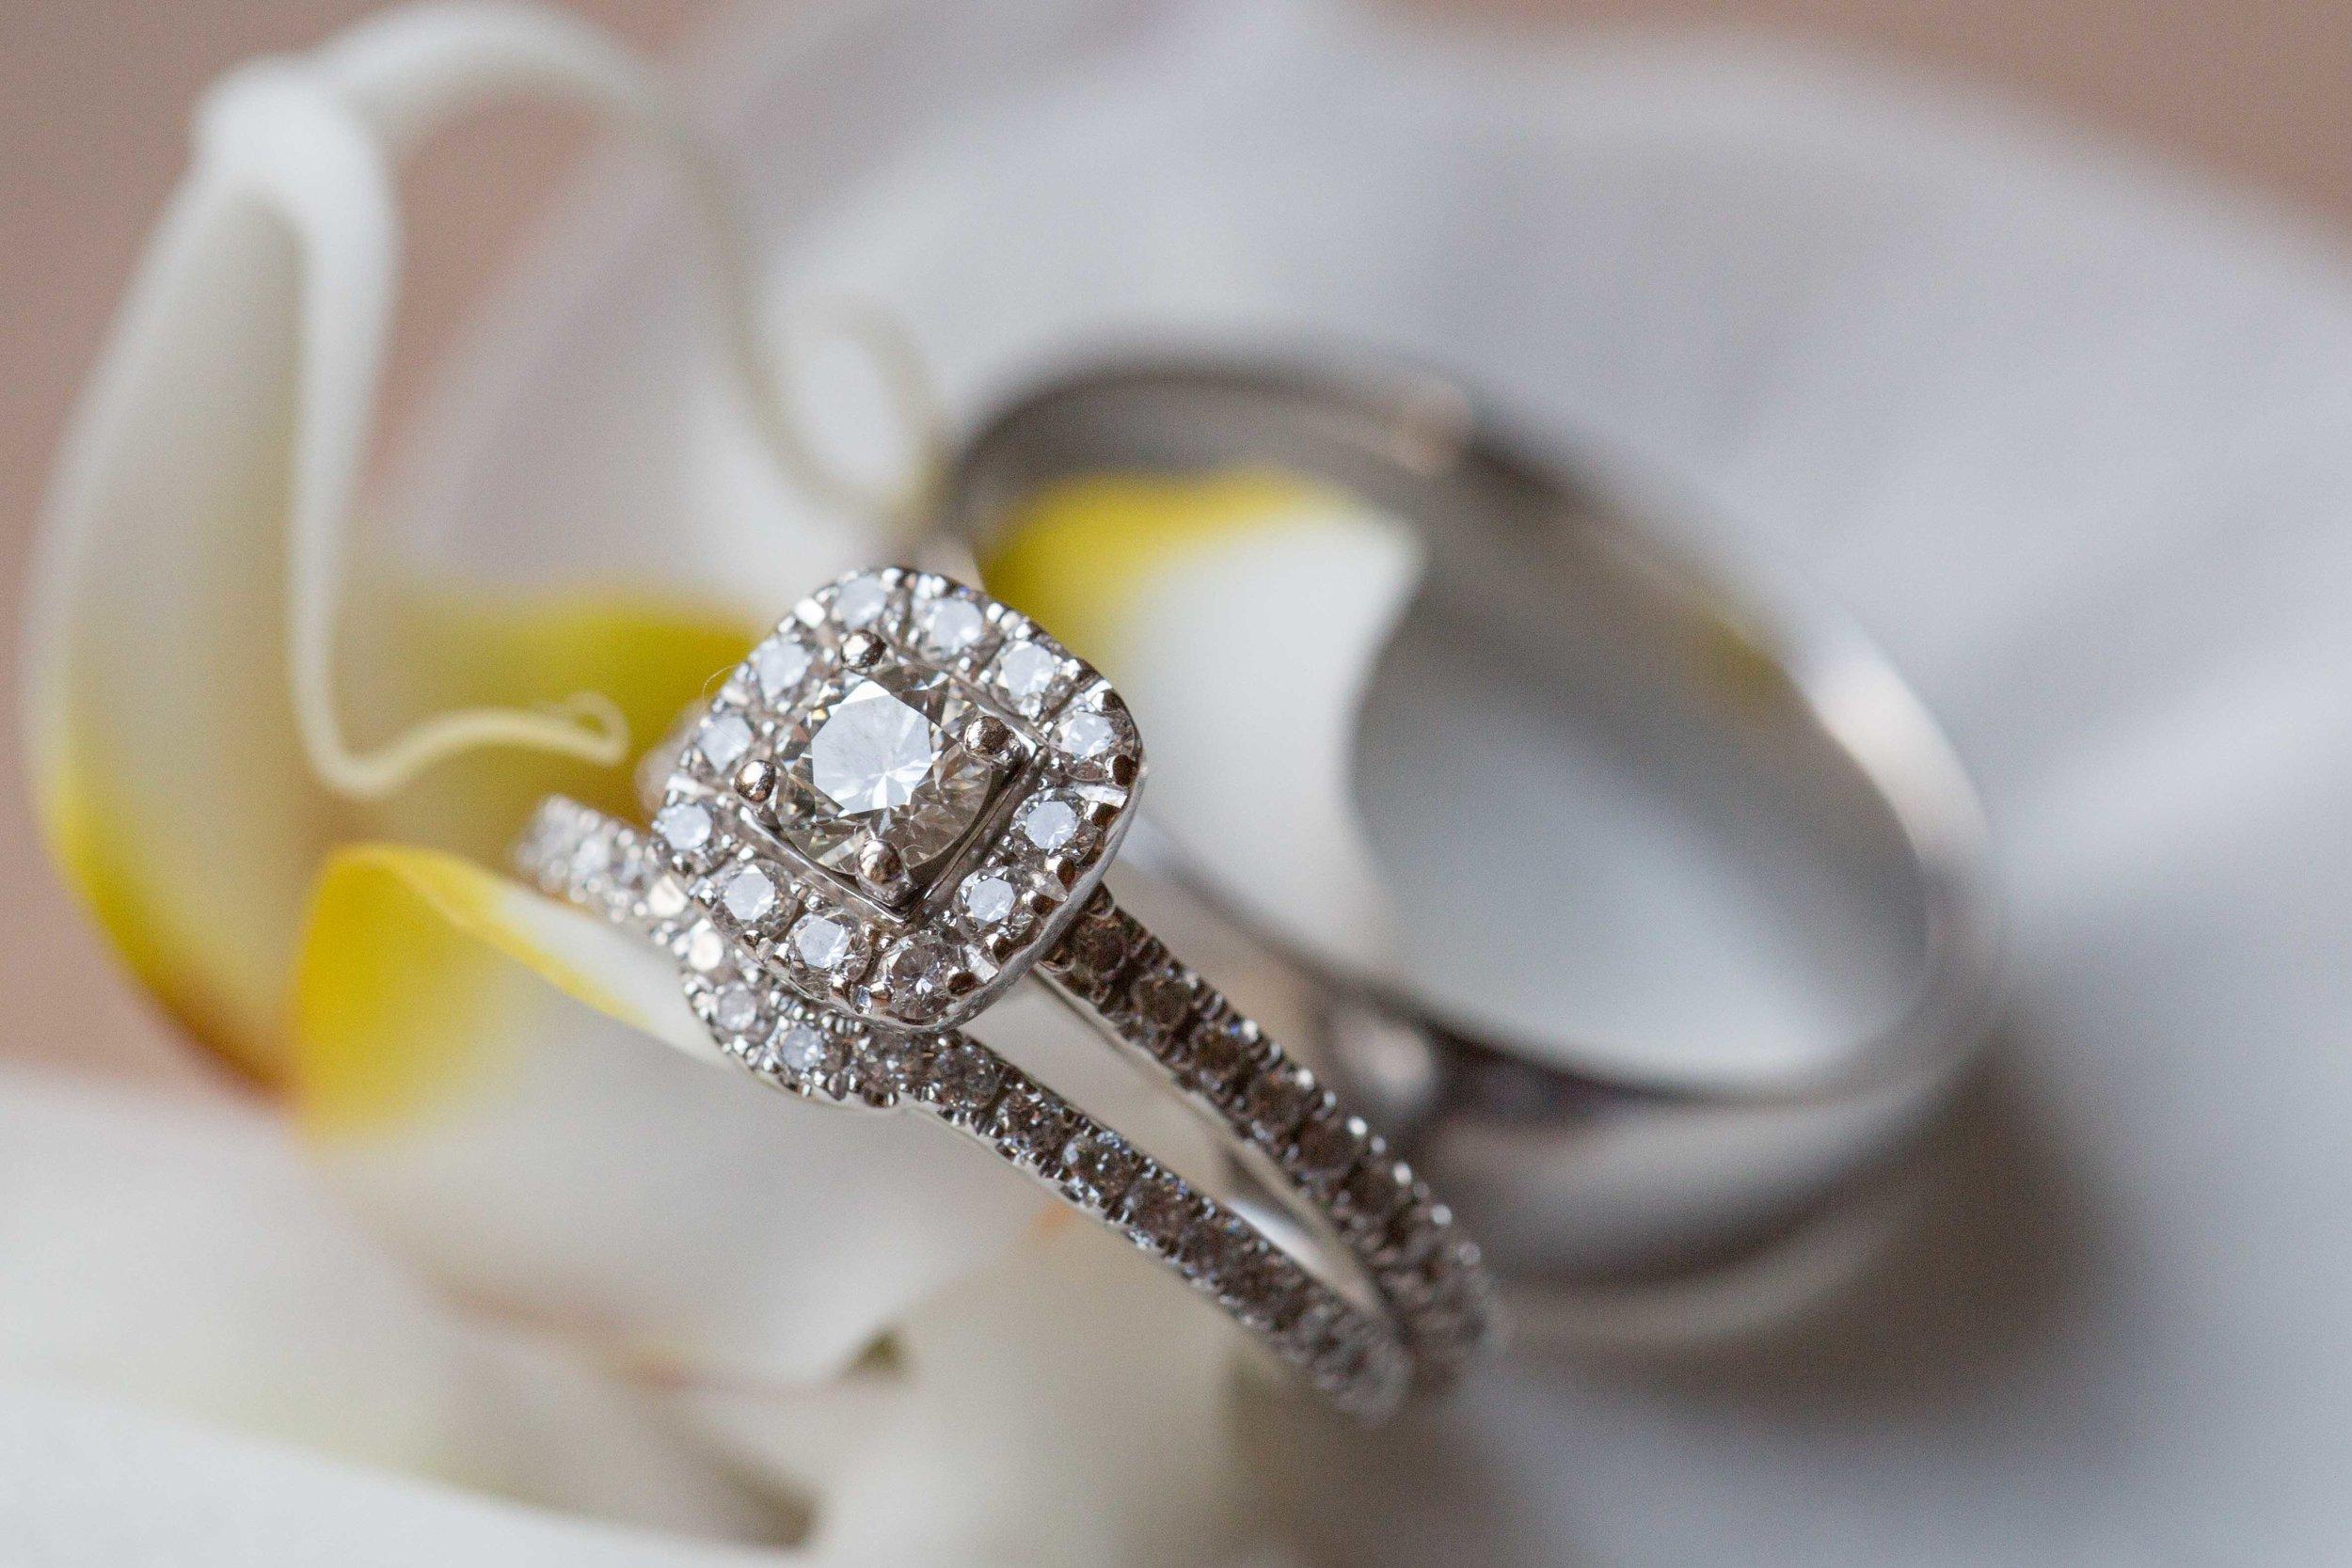 cotswold-wedding-photography-at-stonehouse-court-hotel-natalia-smith-photography-gloucestershire-wedding-photographer-76.jpg